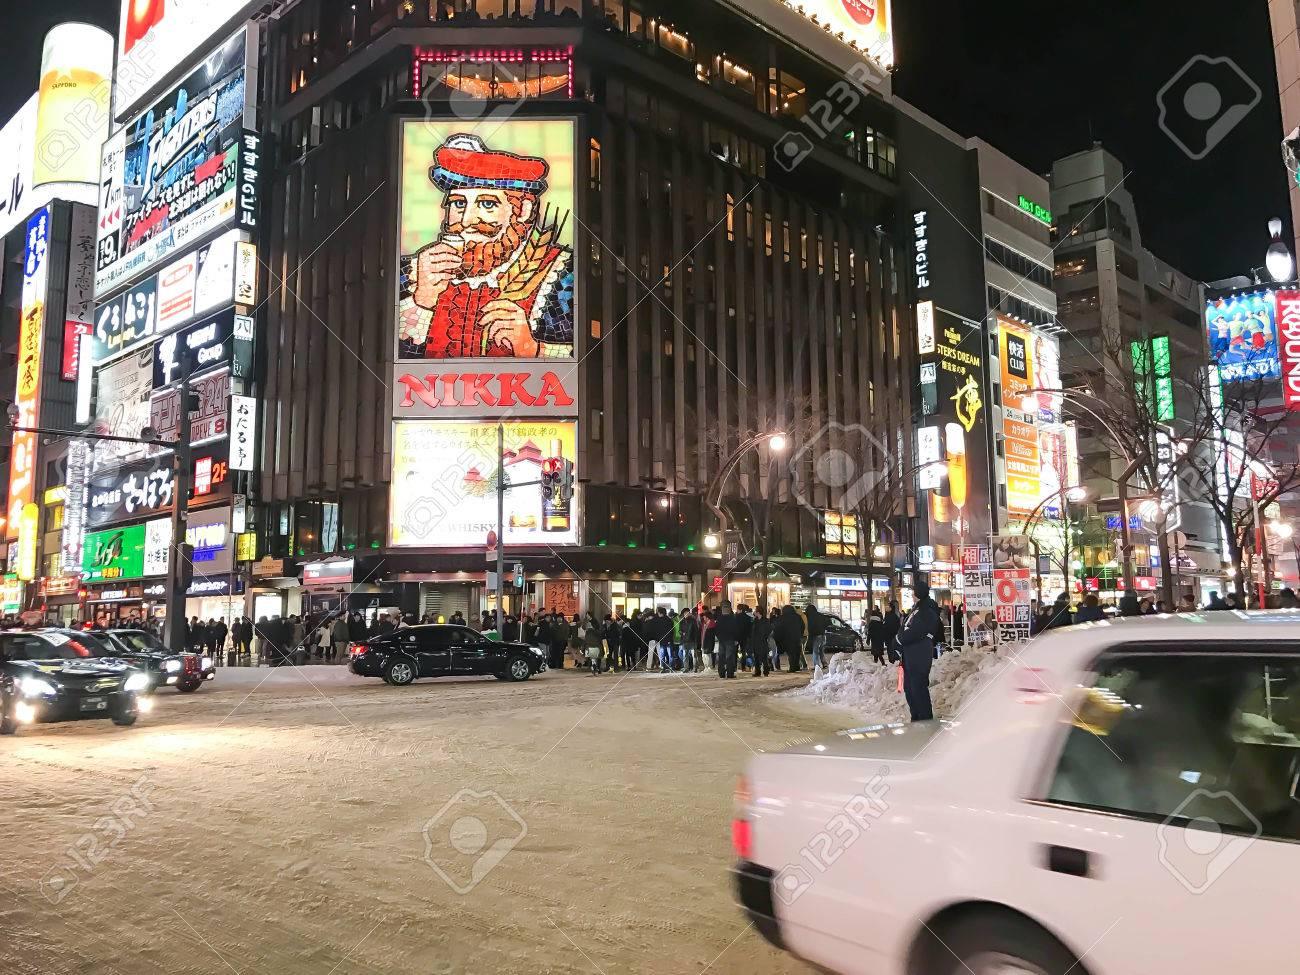 SAPPORO, JAPAN - DEC 17, 2016: Traffic passes through the Susukino